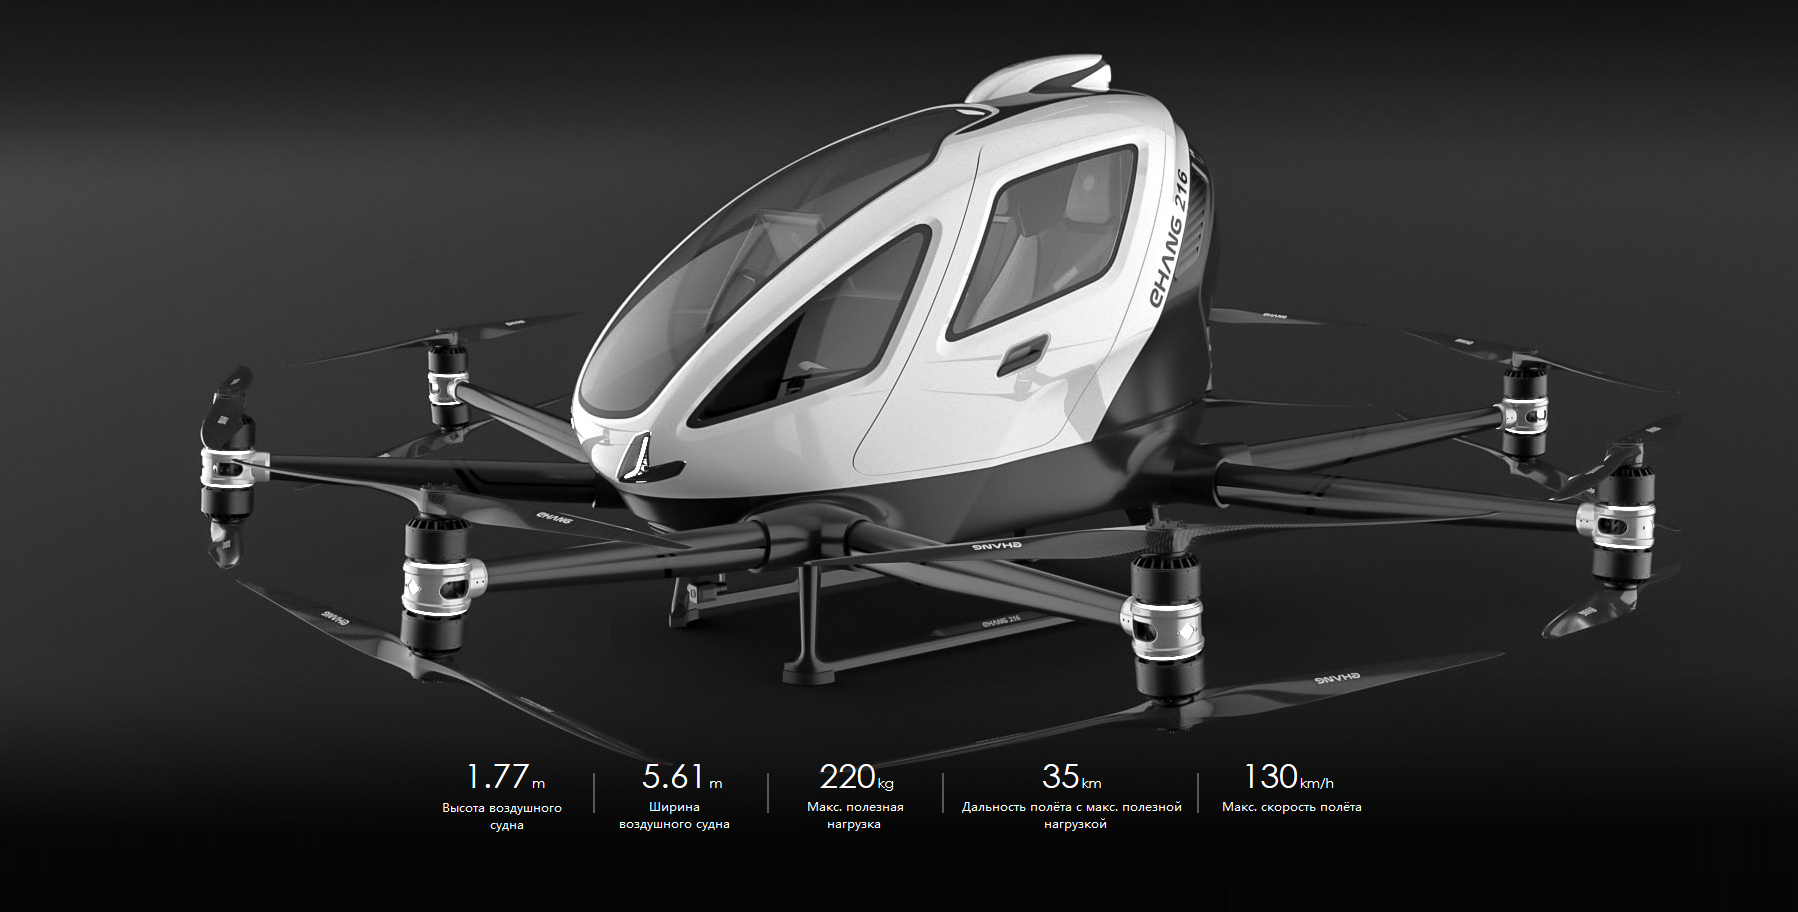 Passenger Self-Flying #Drone. @JobToRob: #news: Jobs to #Robots! #Work for Robots! Hire Robots!